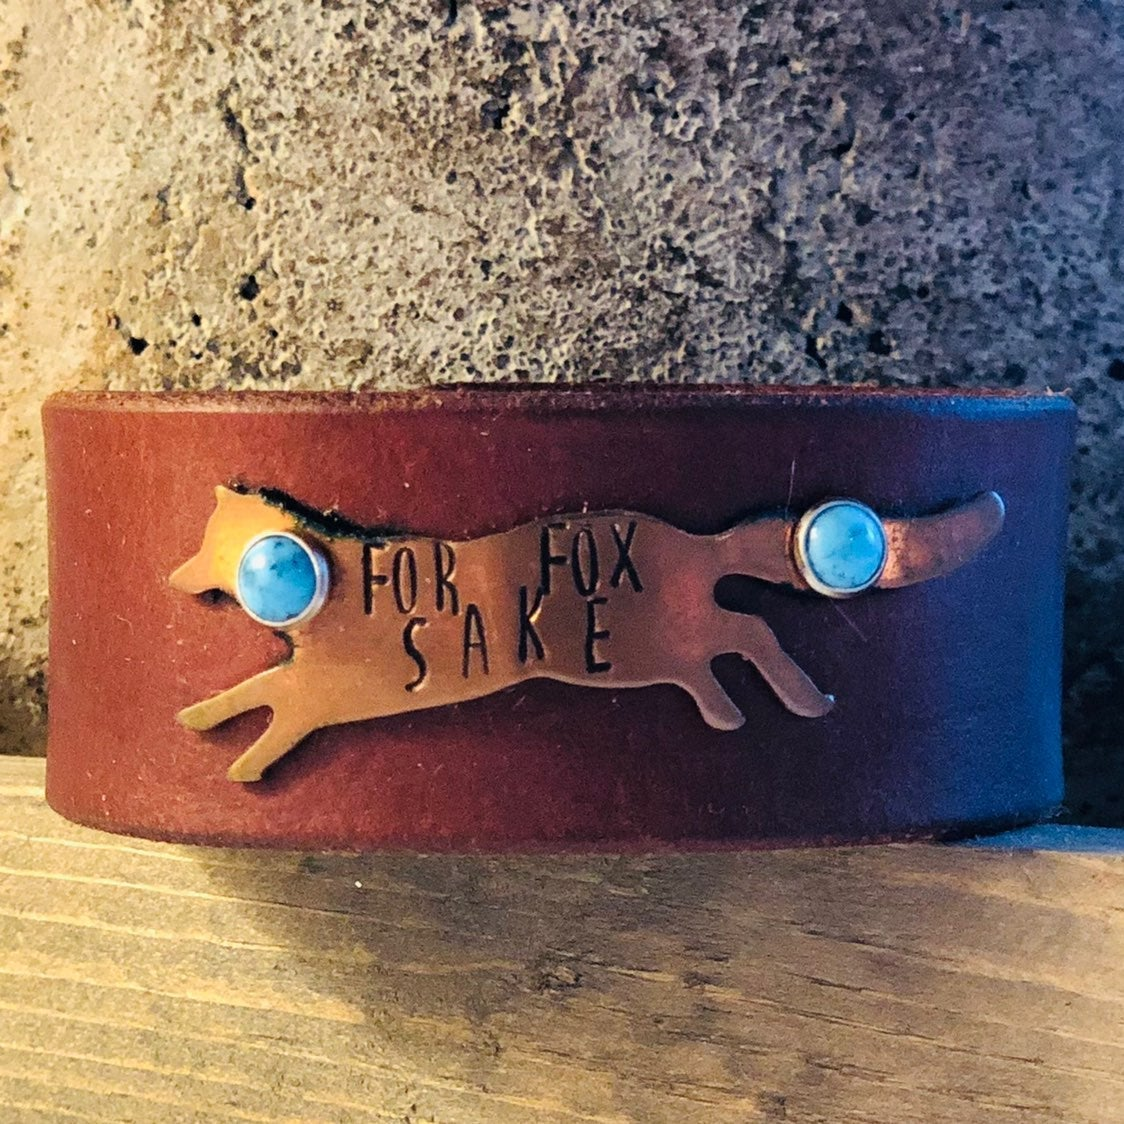 For Fox sake leather cuff bracelet